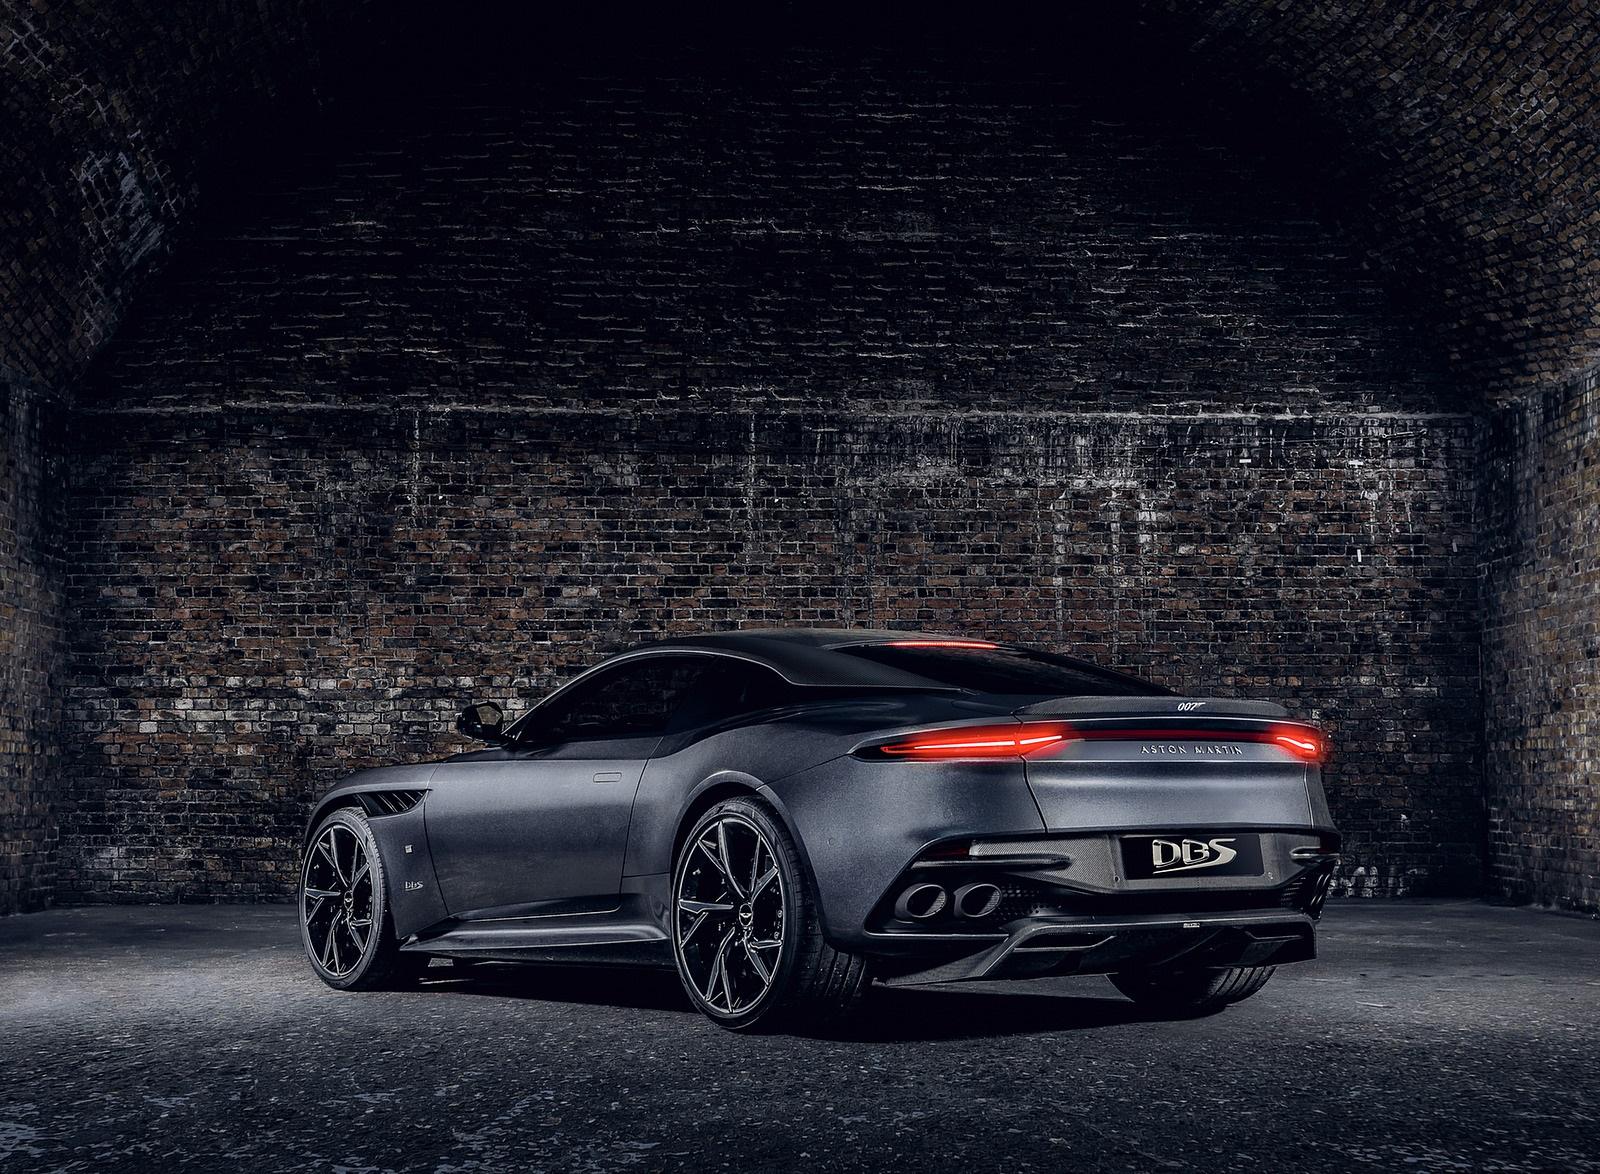 2021 Aston Martin DBS Superleggera 007 Edition Rear Three-Quarter Wallpapers (3)